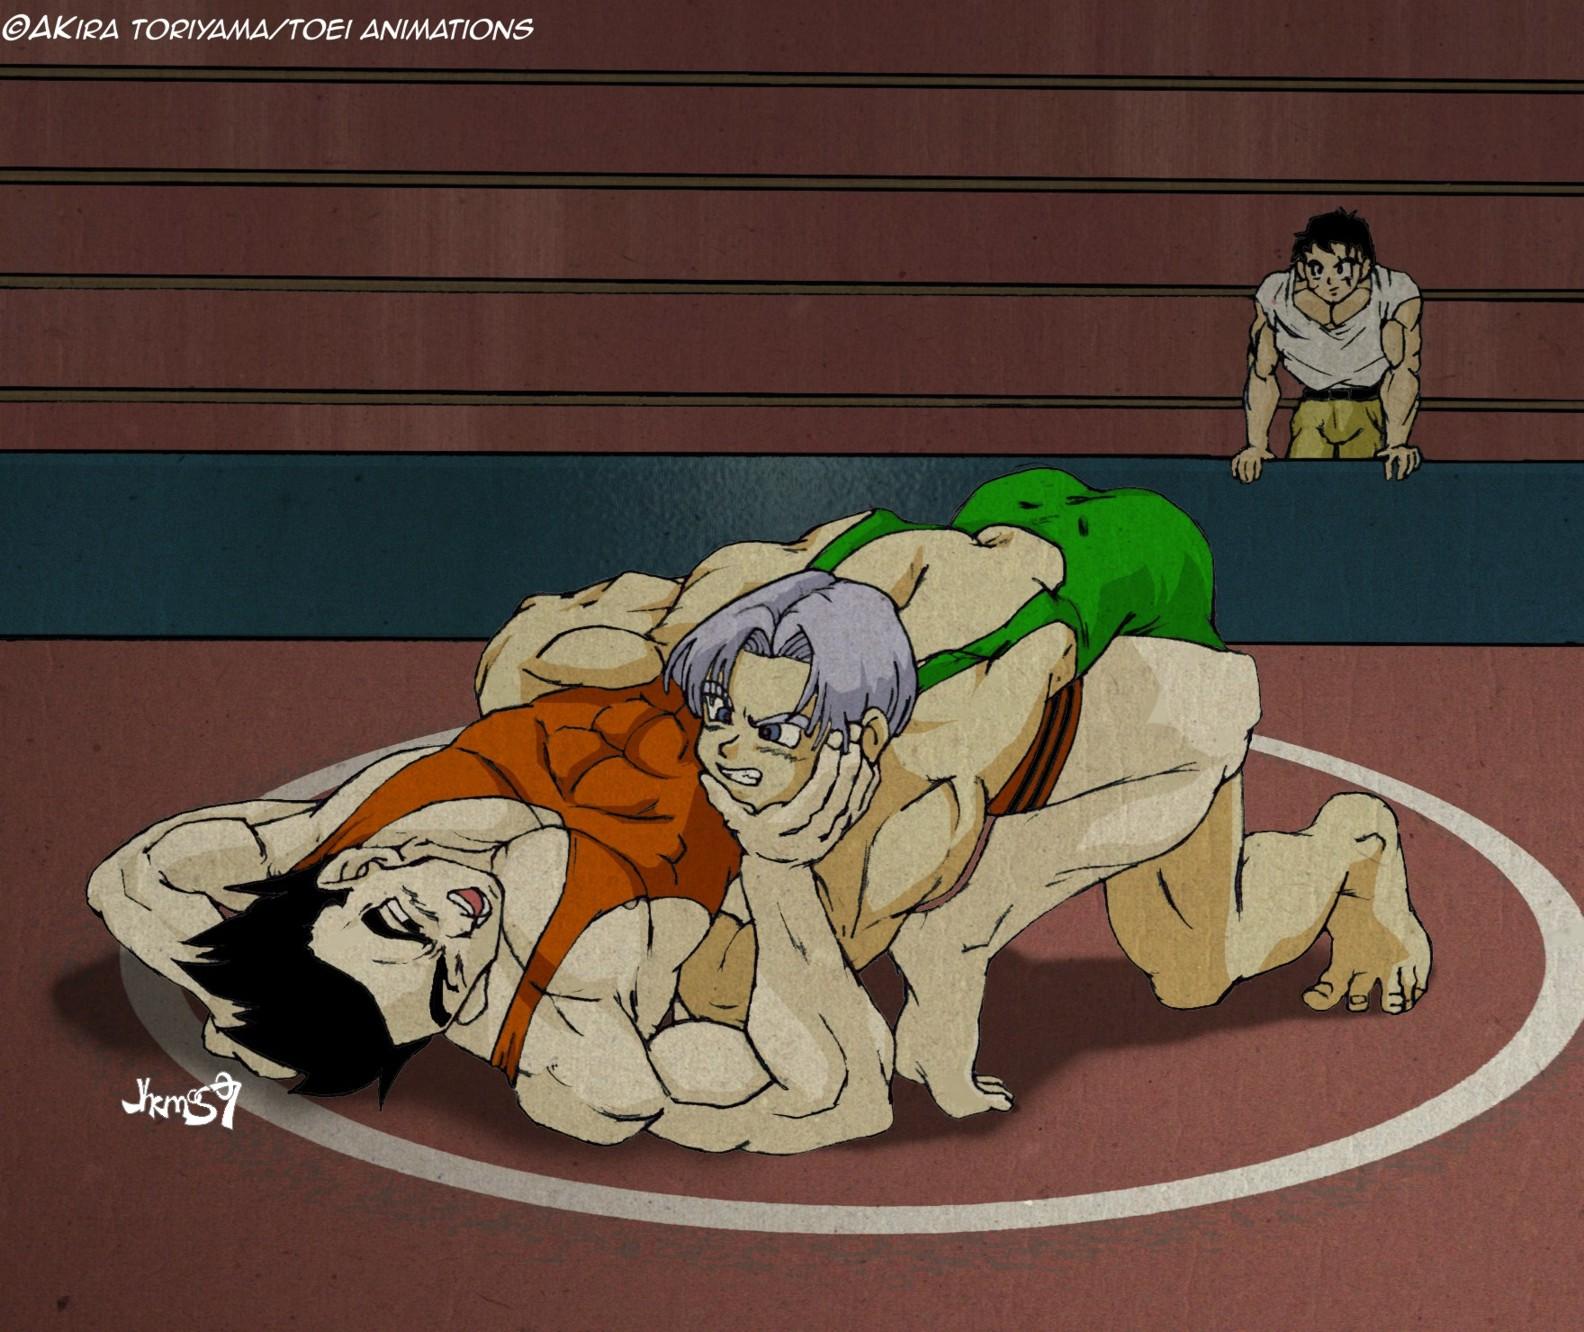 Anime wrestling nude hentai video